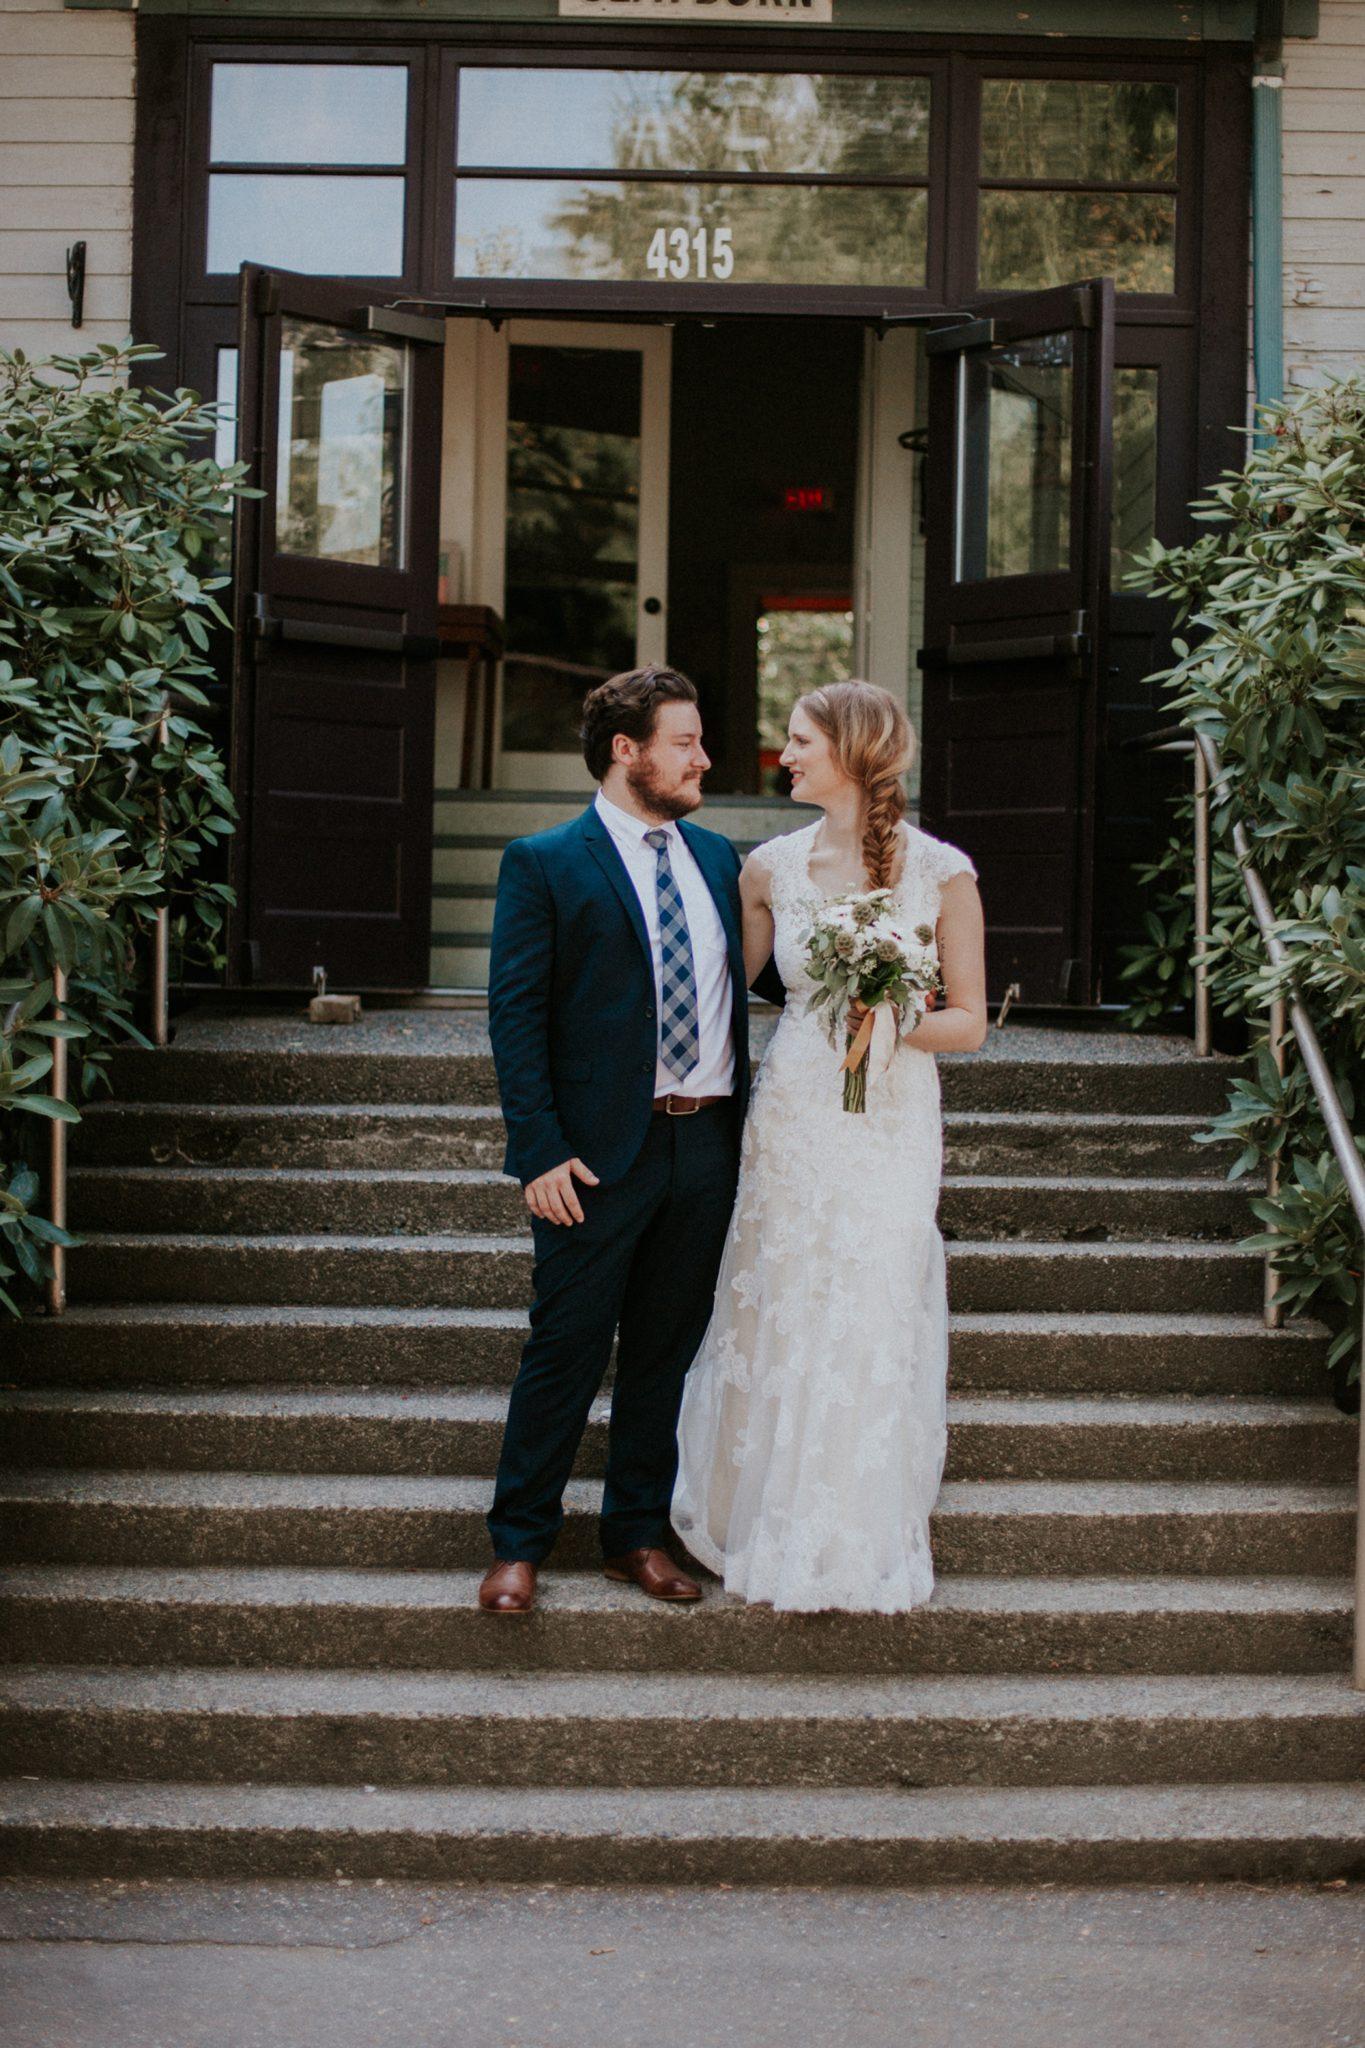 844-abbotsford-wedding-photographer